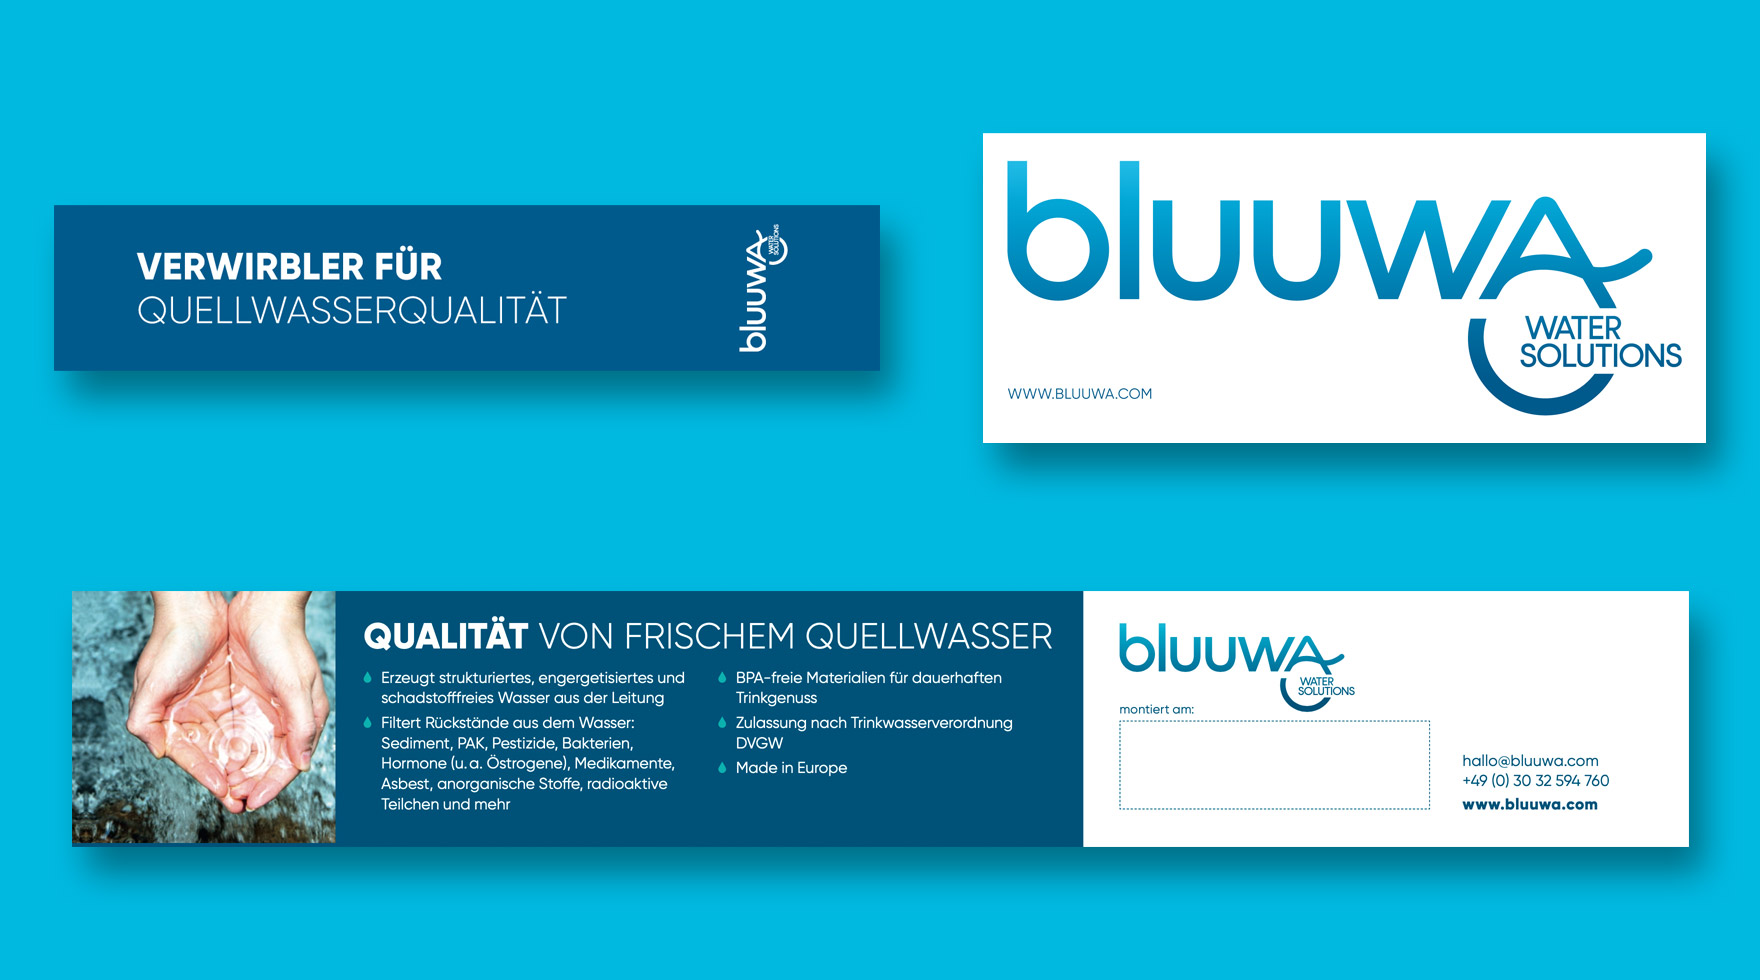 produkt-design-bluuwa-berlin